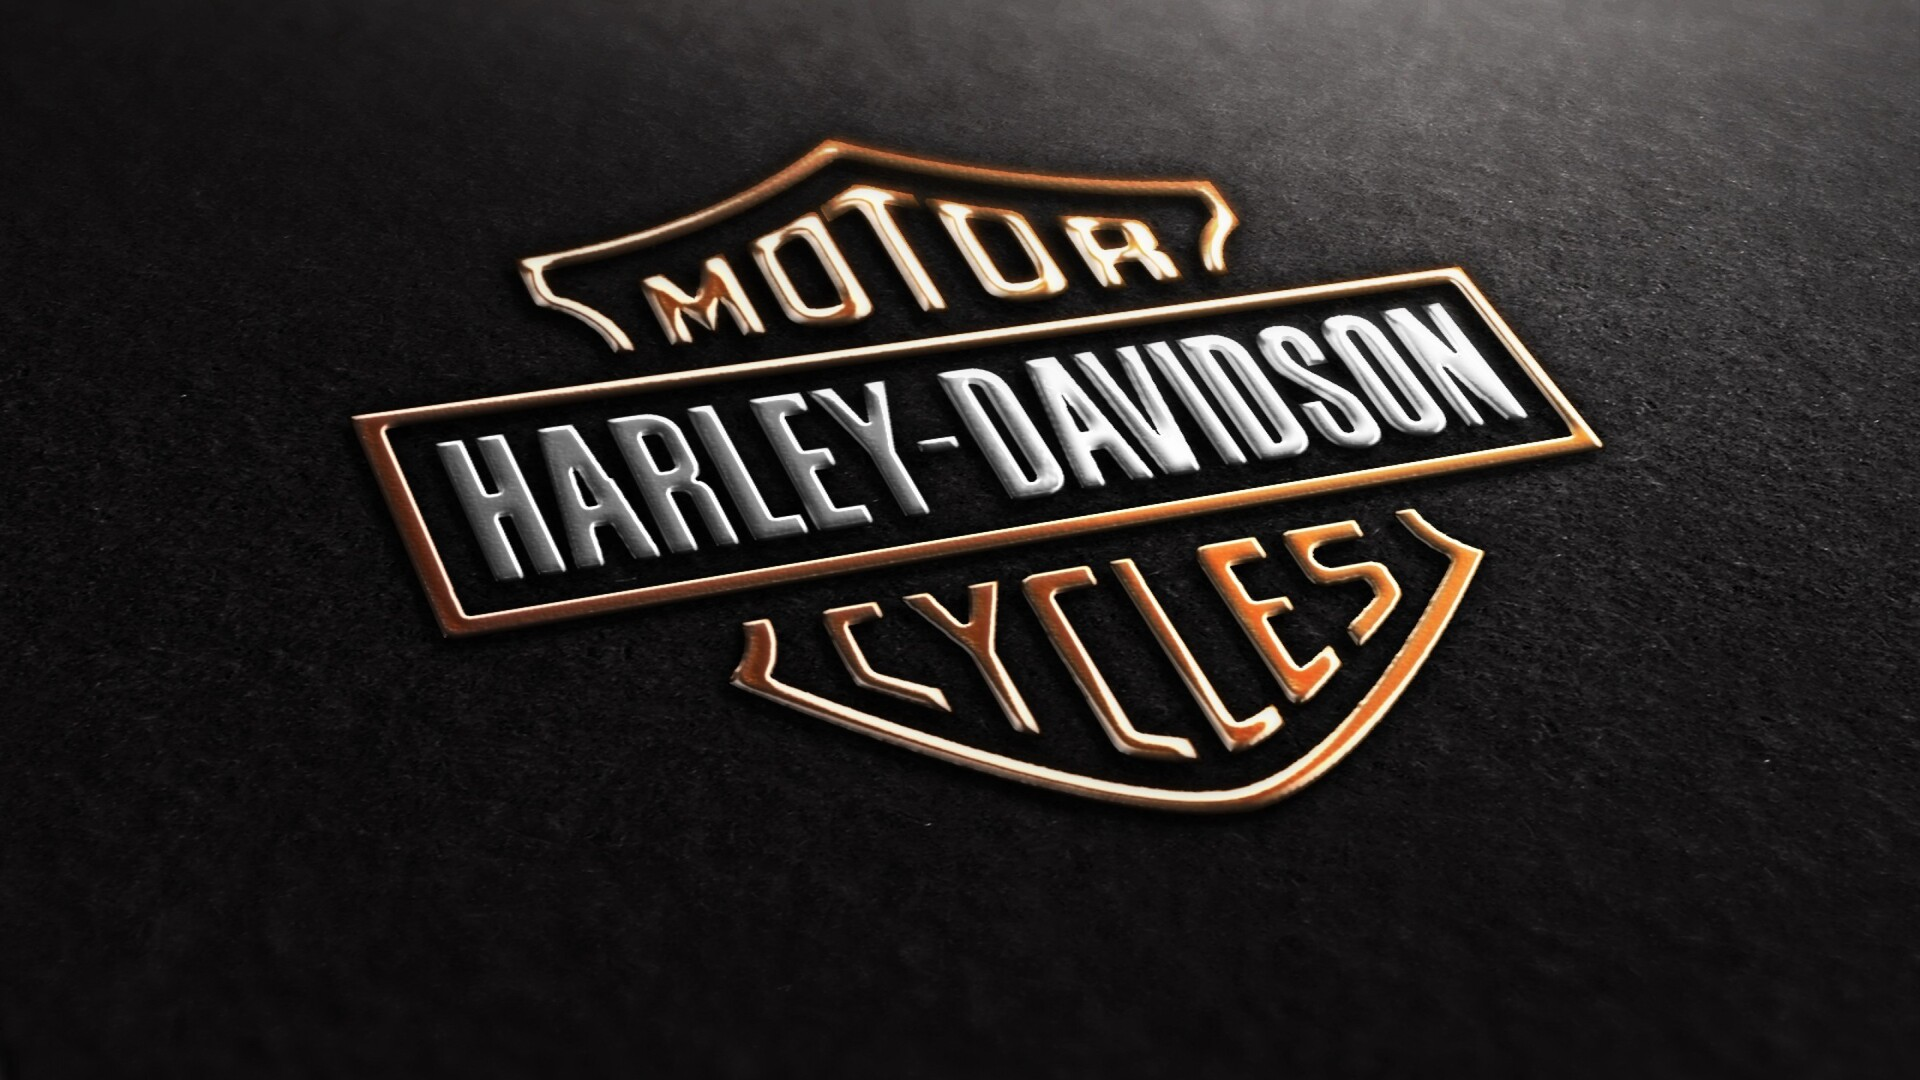 1920x1080 harley davidson logo laptop full hd 1080p hd 4k